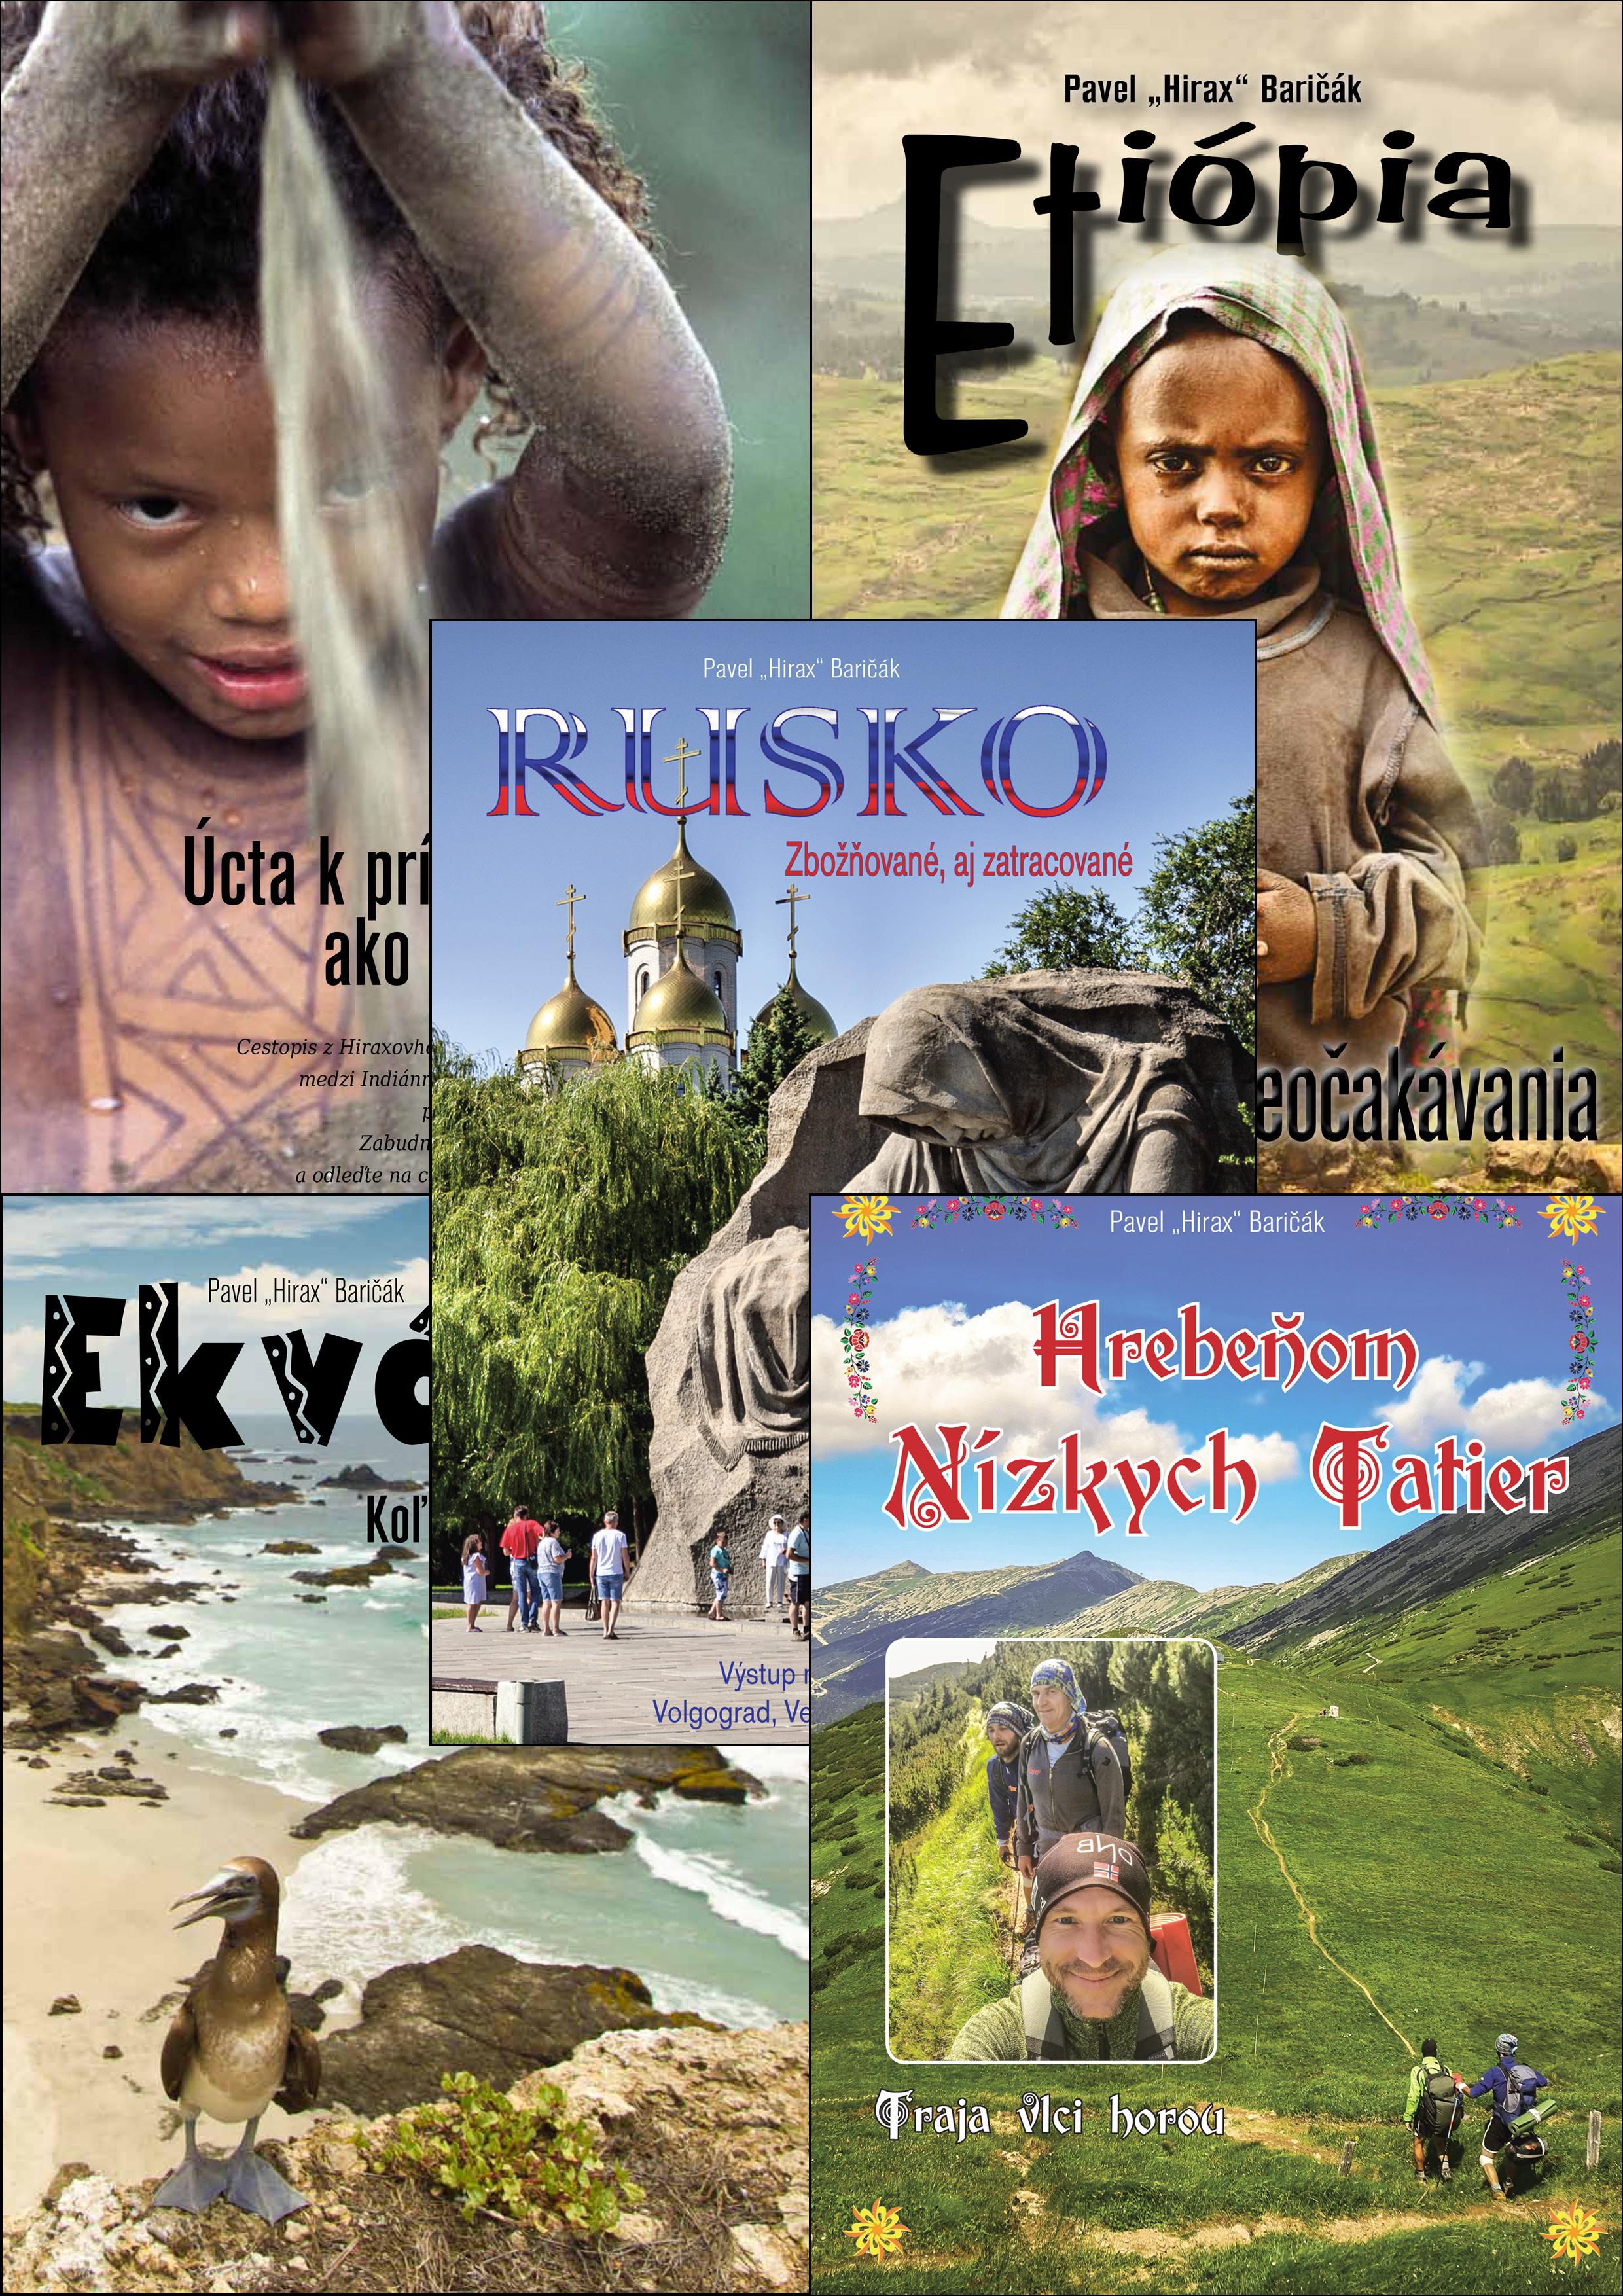 Prechod hrebeňom Nízkych Tatier + Ekvádor + Etiópia + Rusko + Panama / Kostarika - Baričák Hirax Pavel